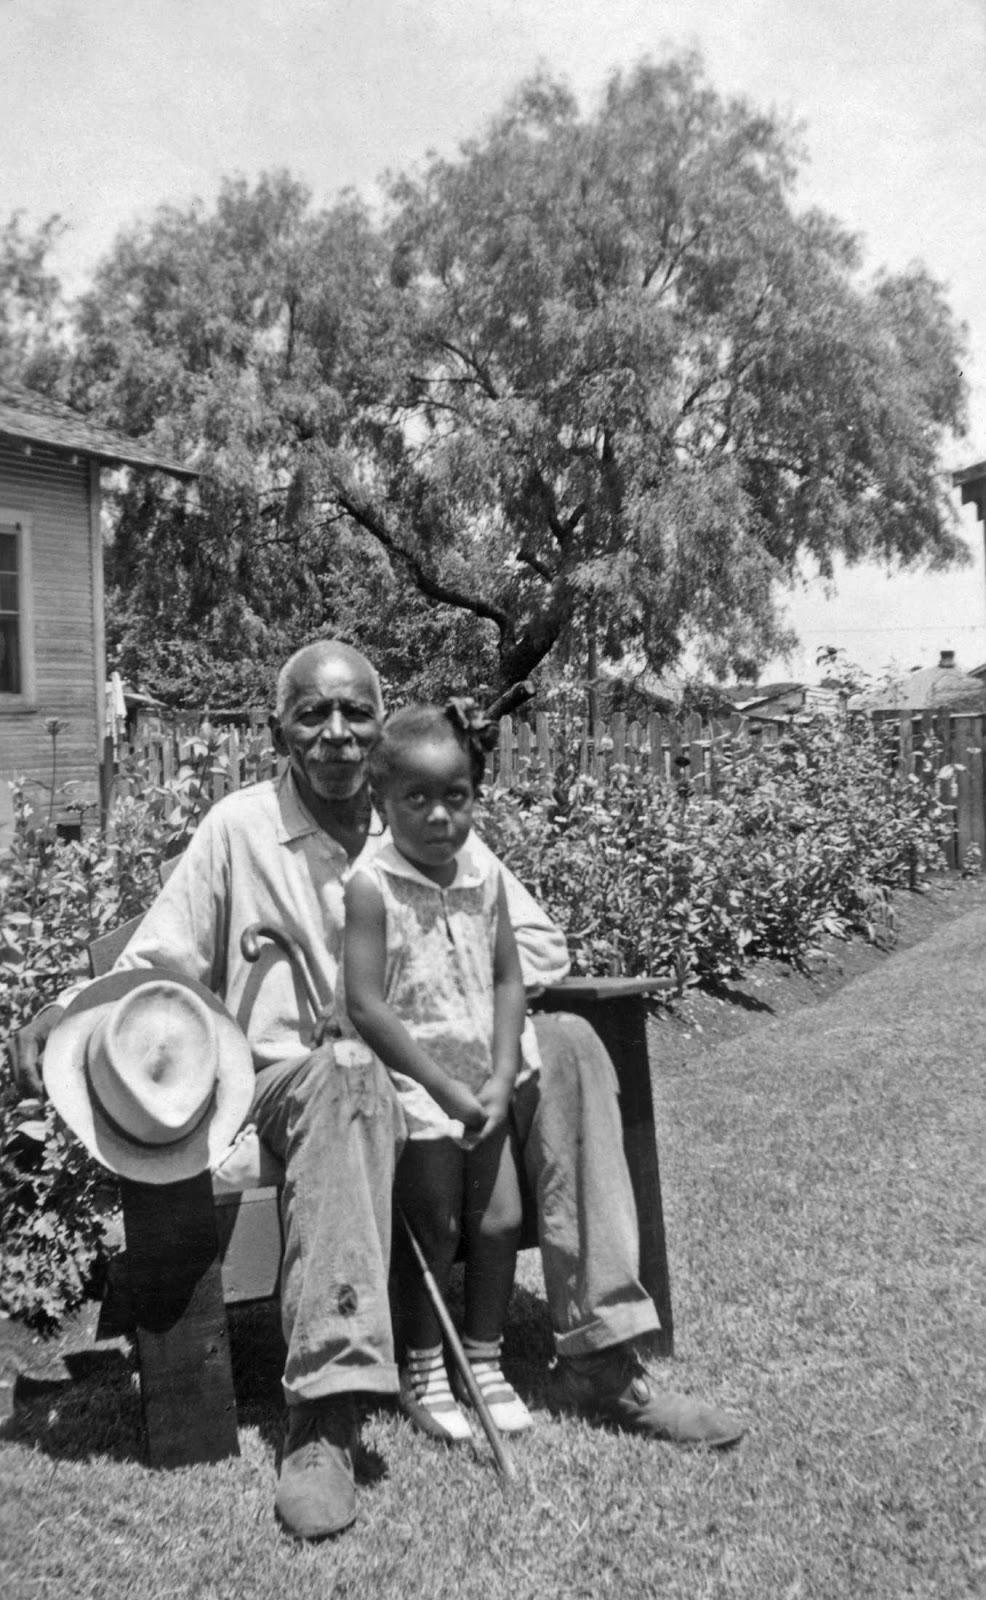 History in Photos: Born in Slavery